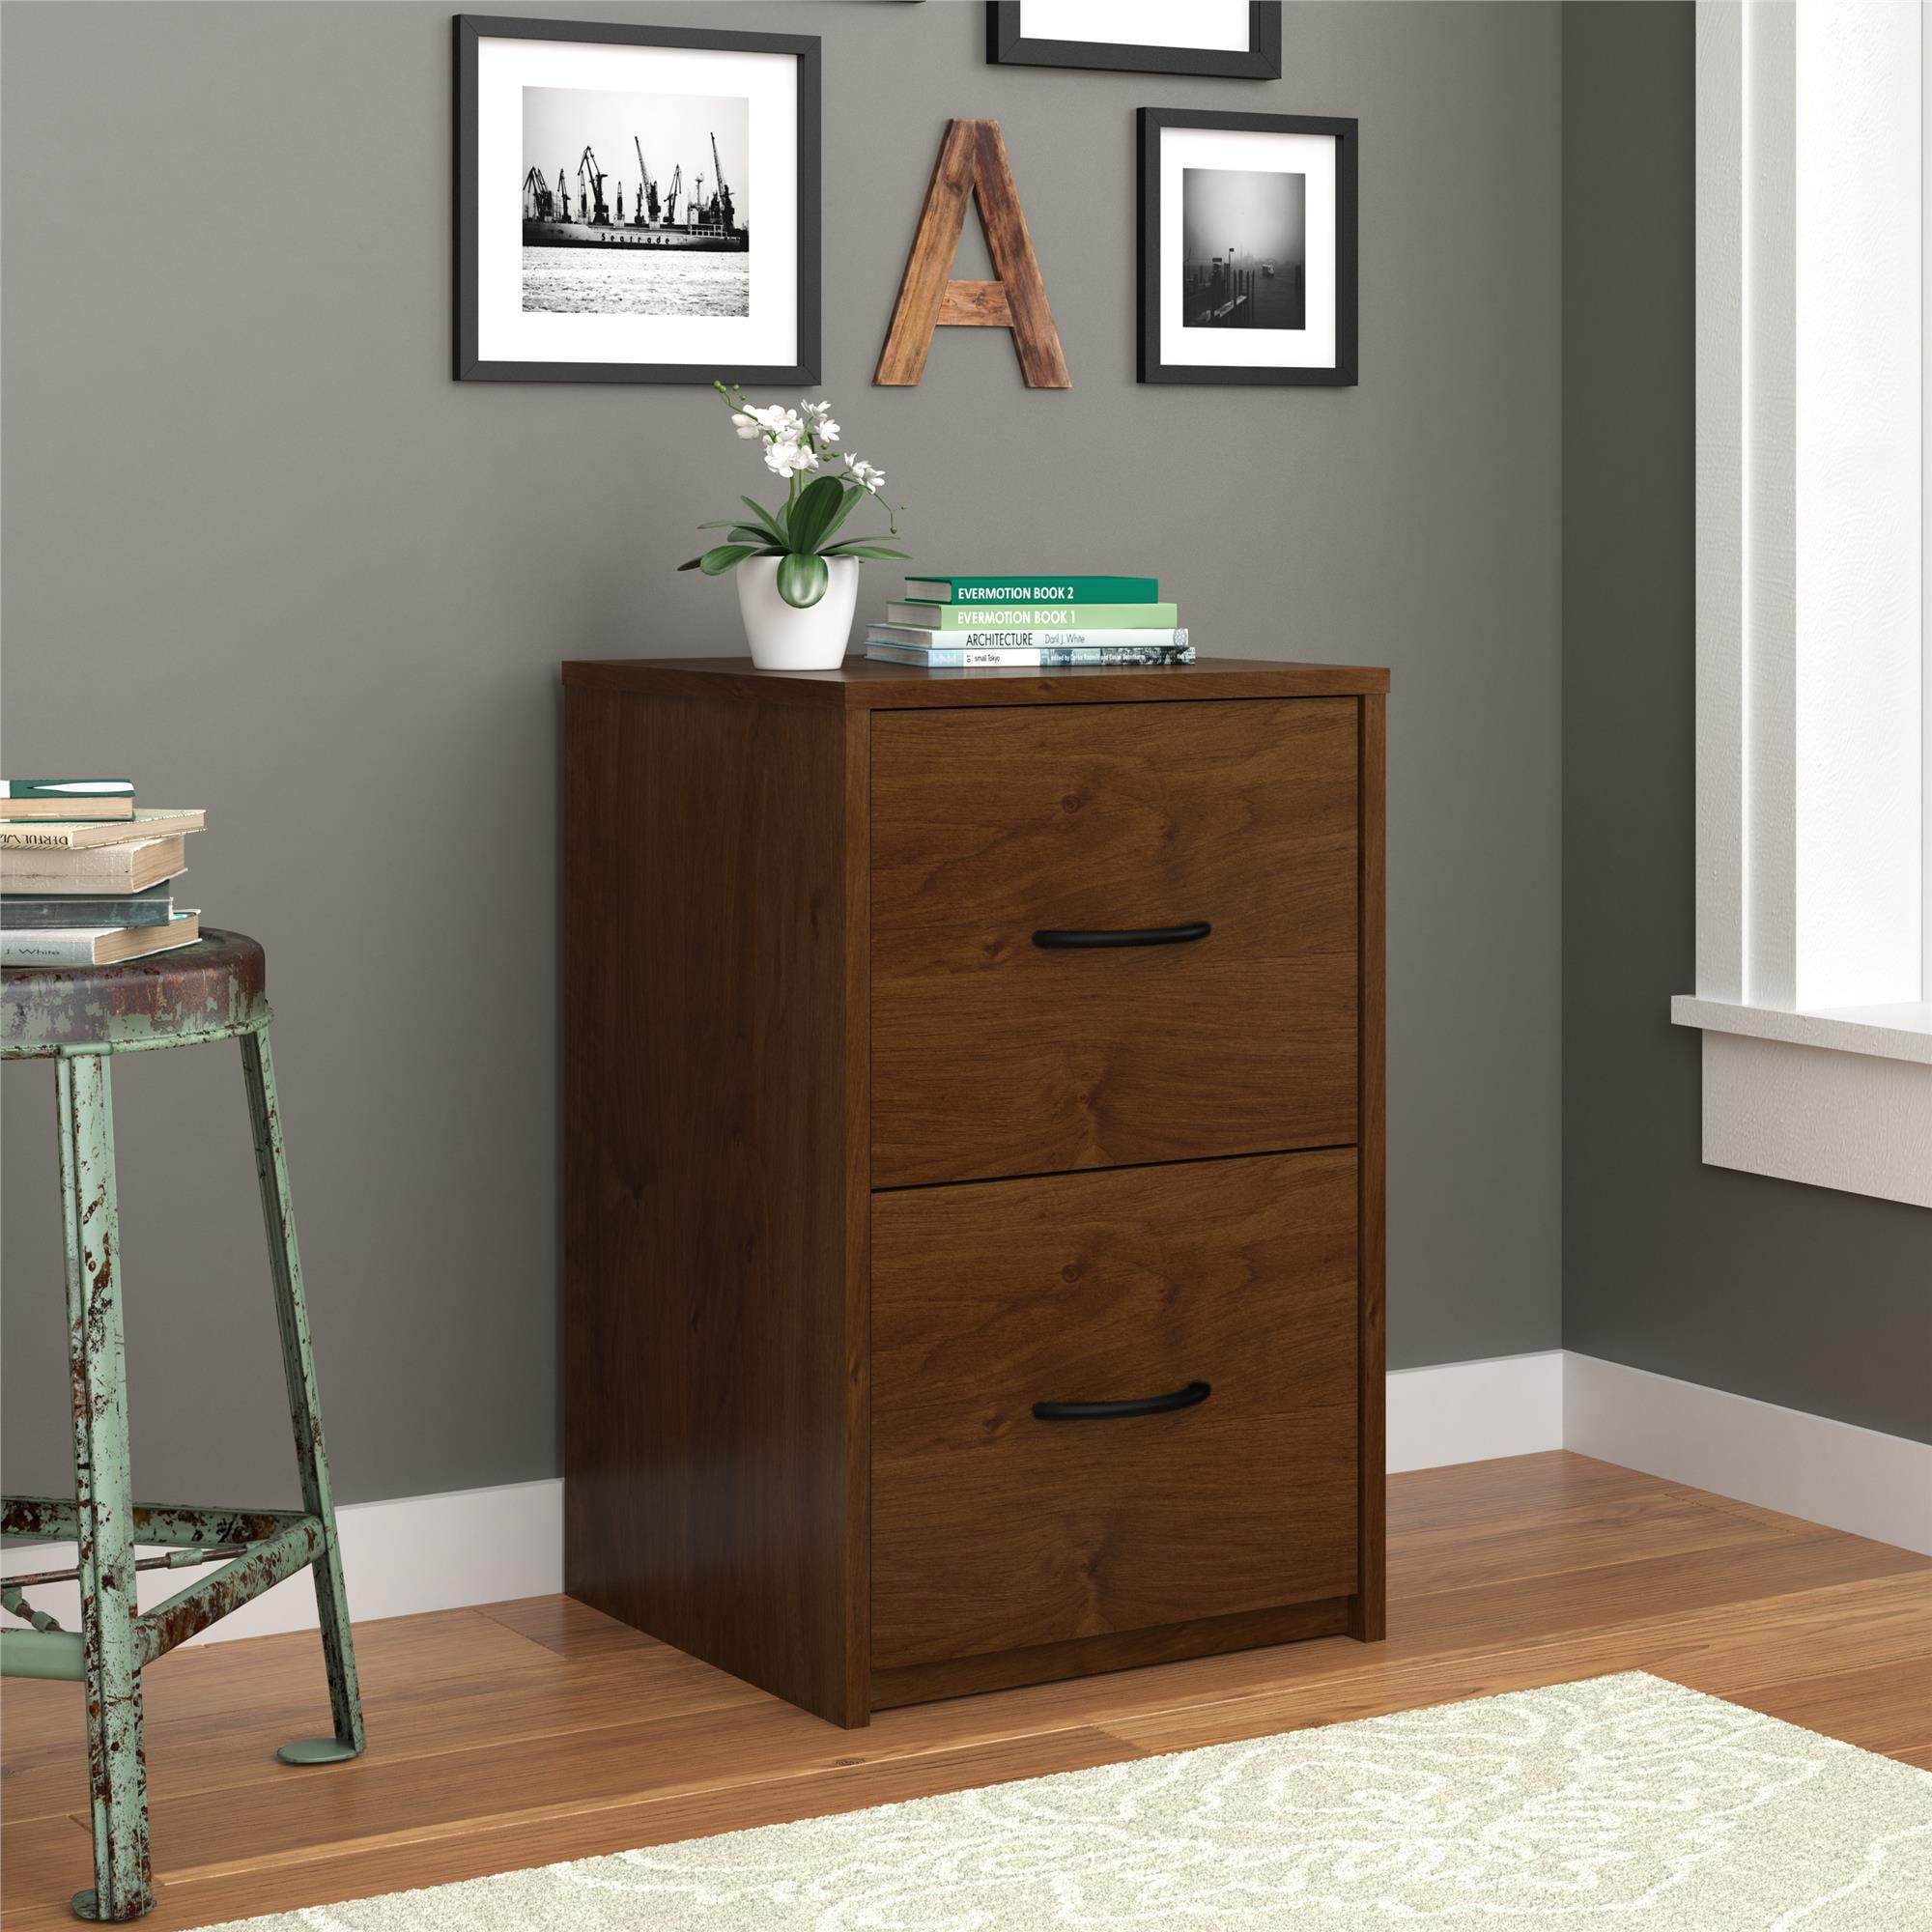 Picture of: Ameriwood Home Core 2 Drawer File Cabinet Medium Brown Walmart Com Walmart Com